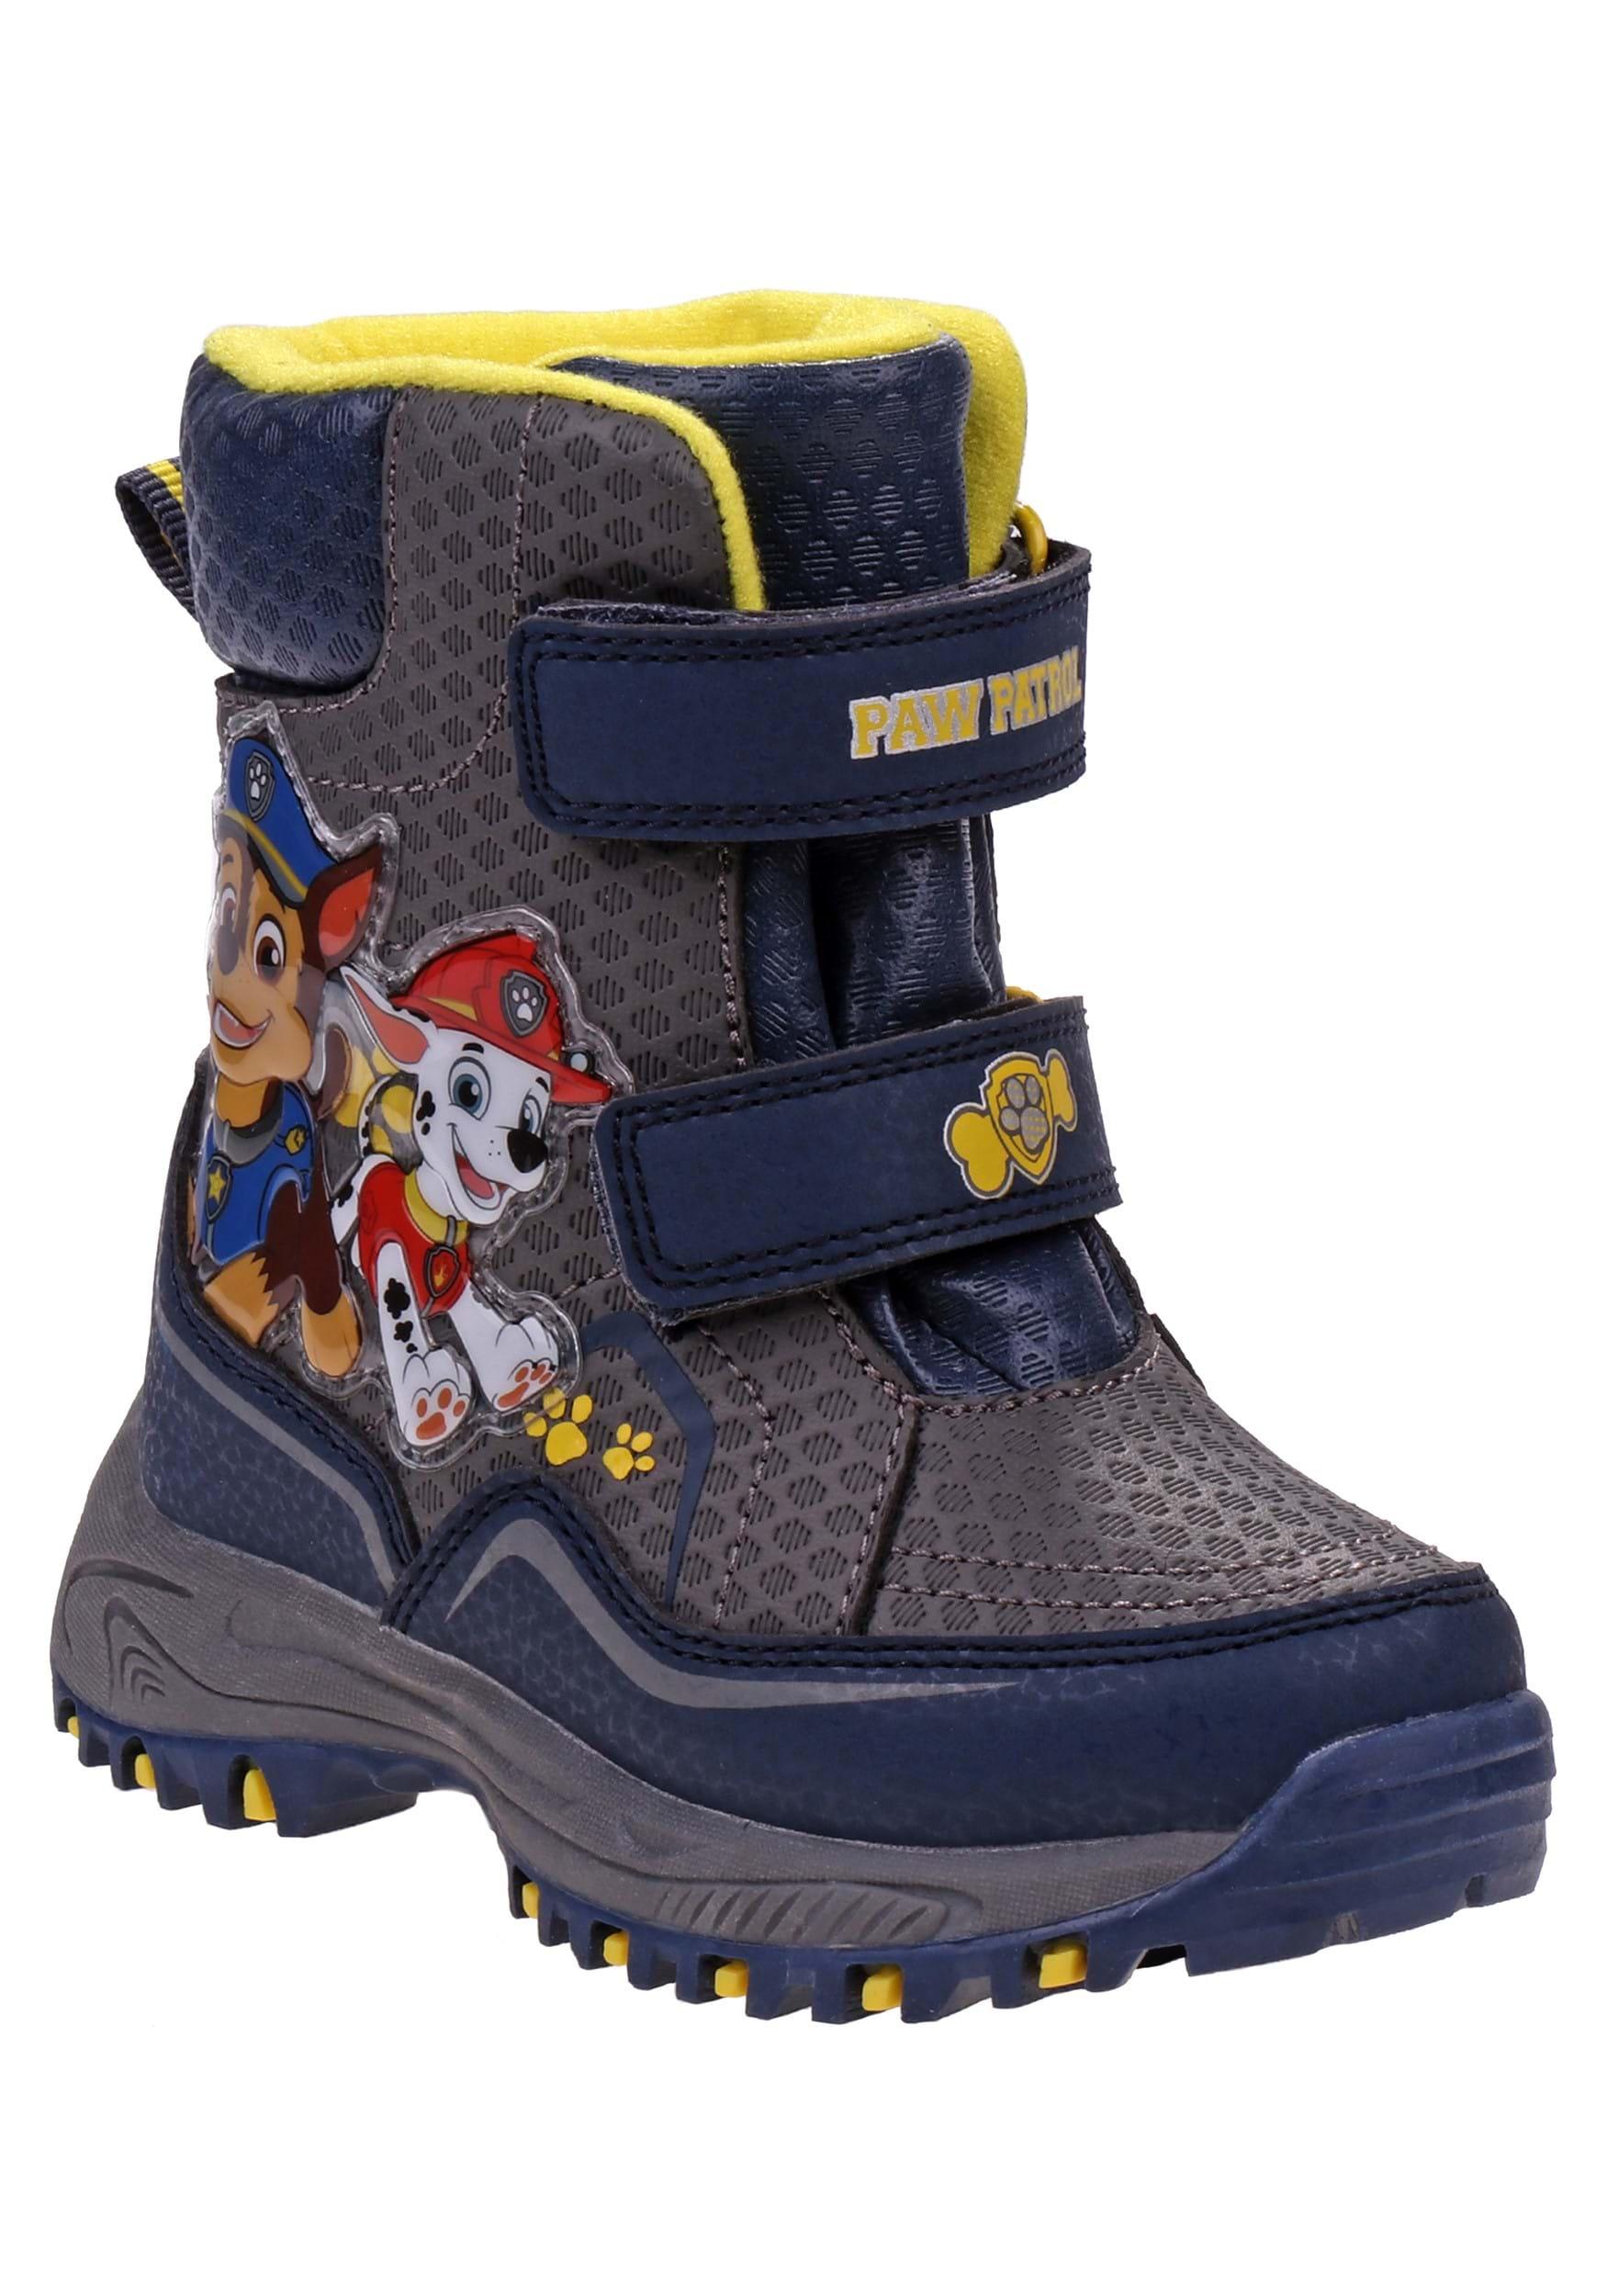 Kids Paw Patrol Snow Boots